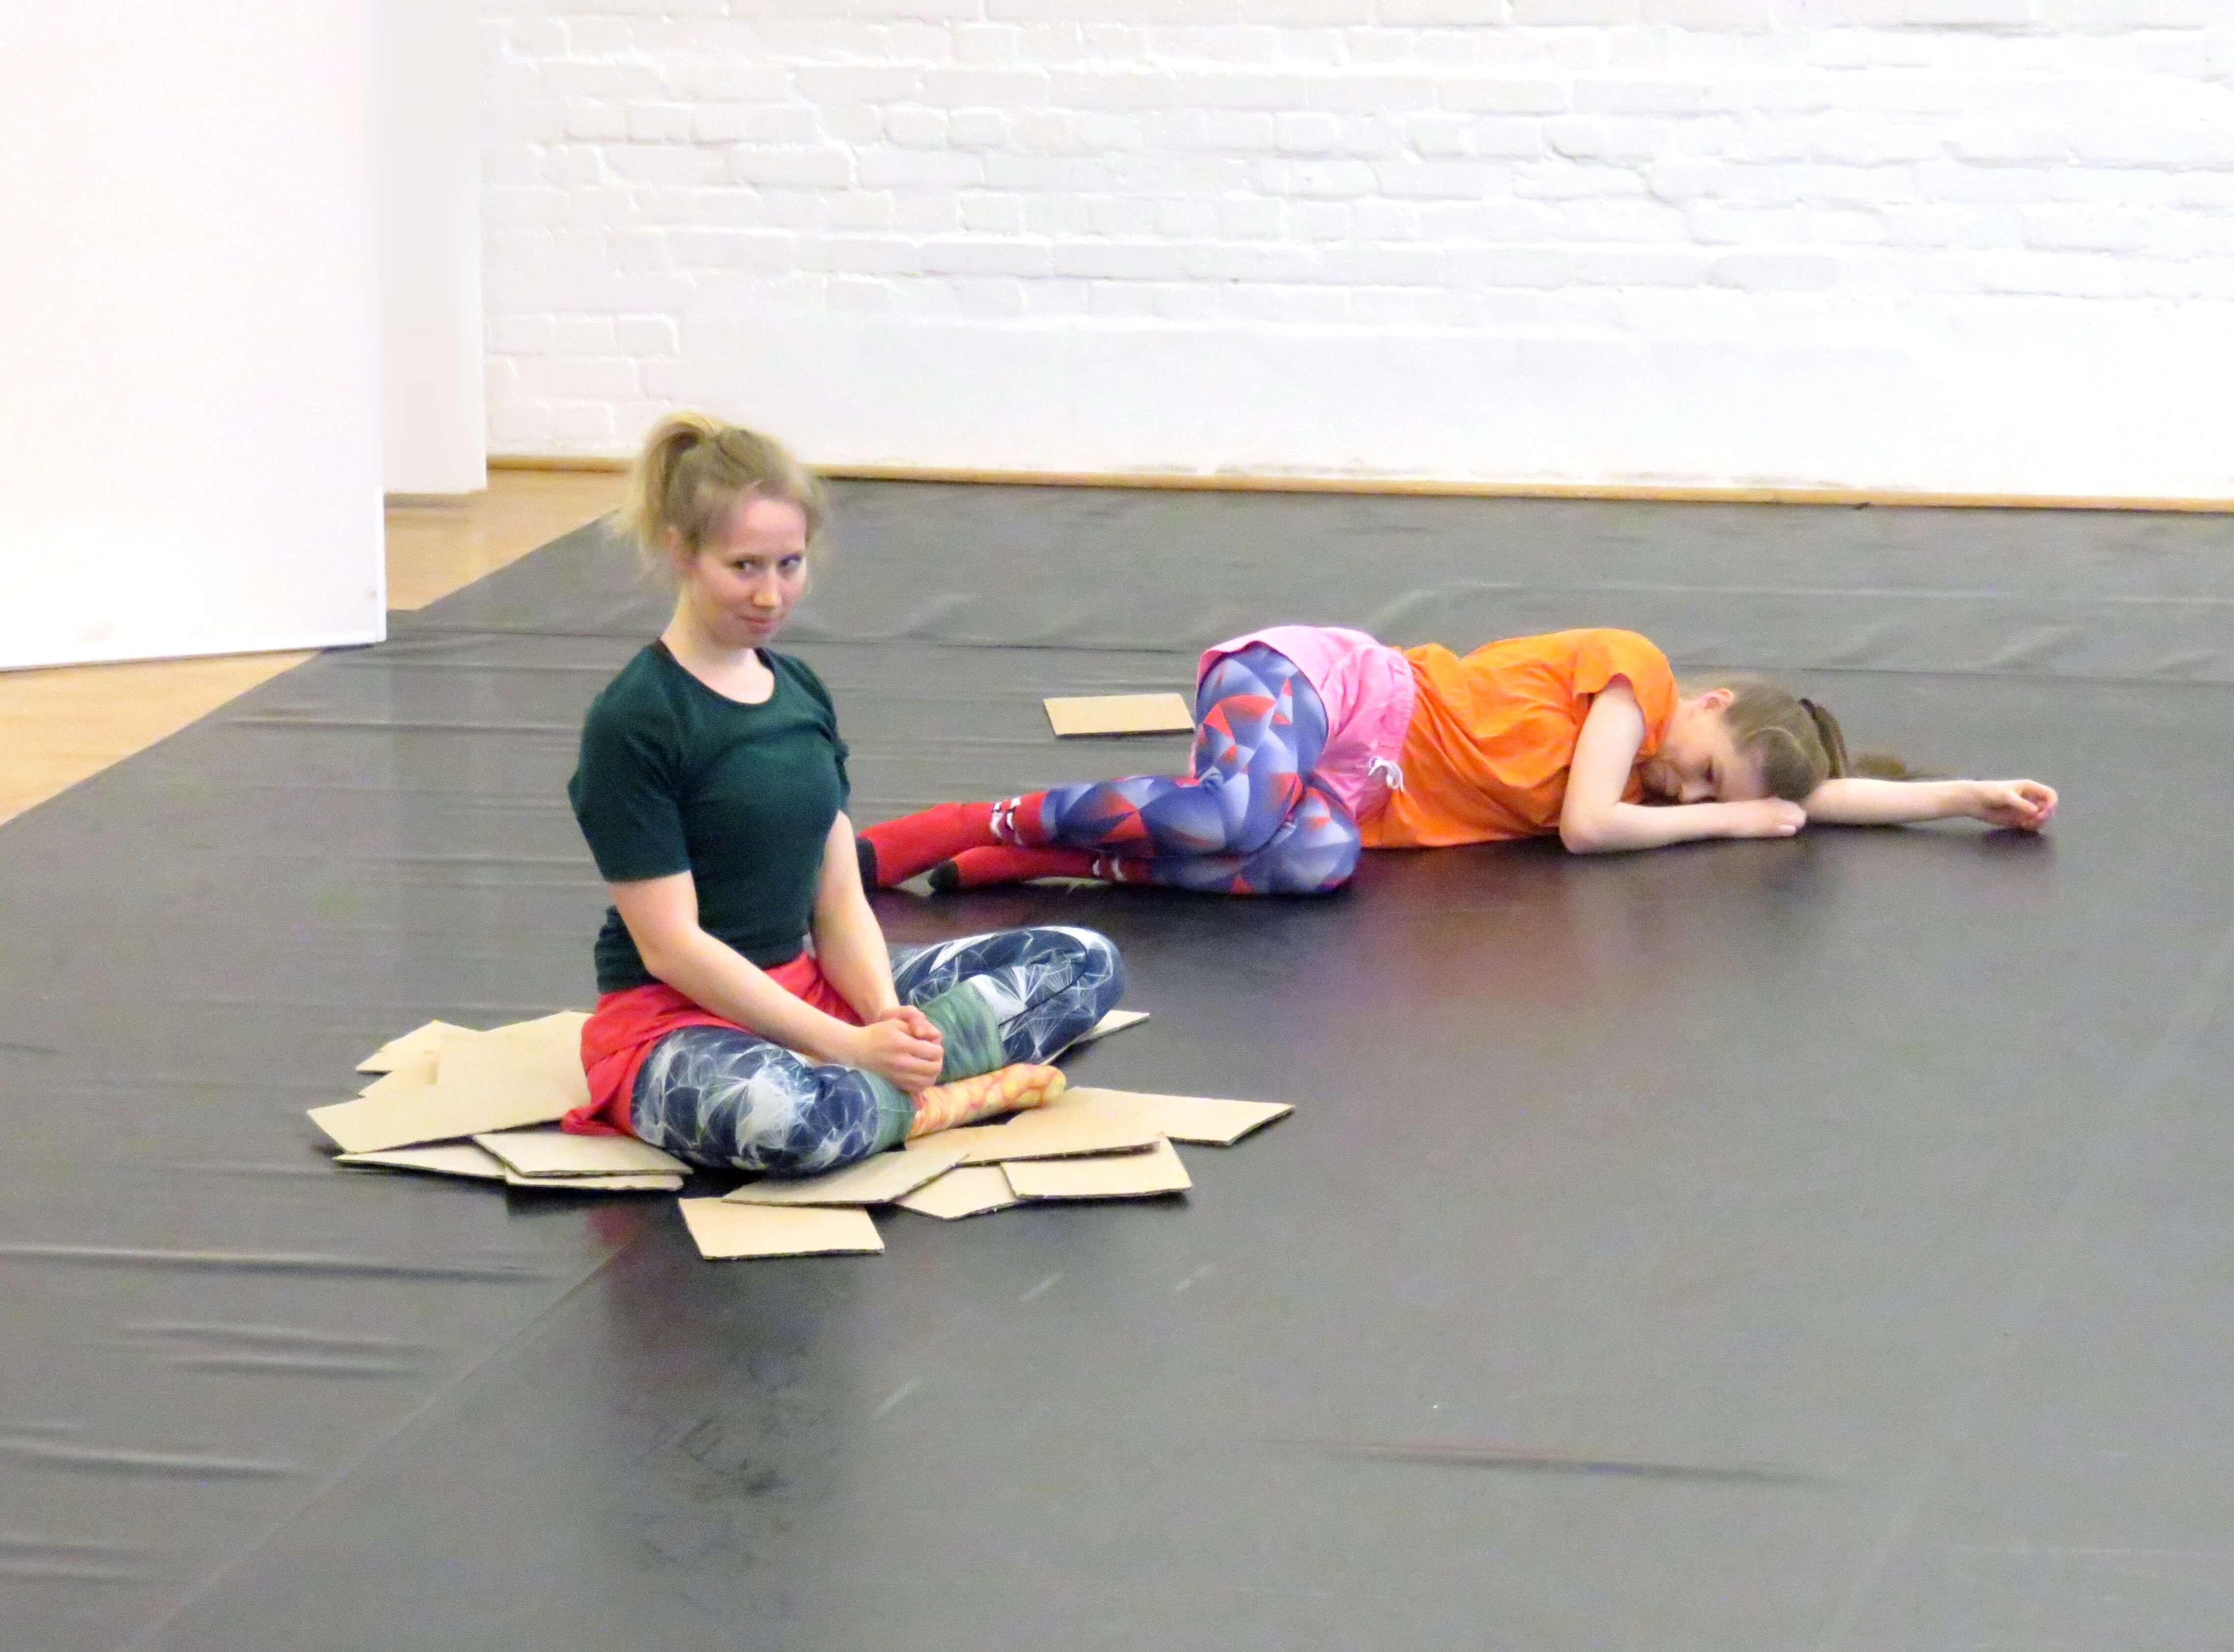 31-IMG_4826-1-lola-rogge-schule-uptanzen-maerz-2019